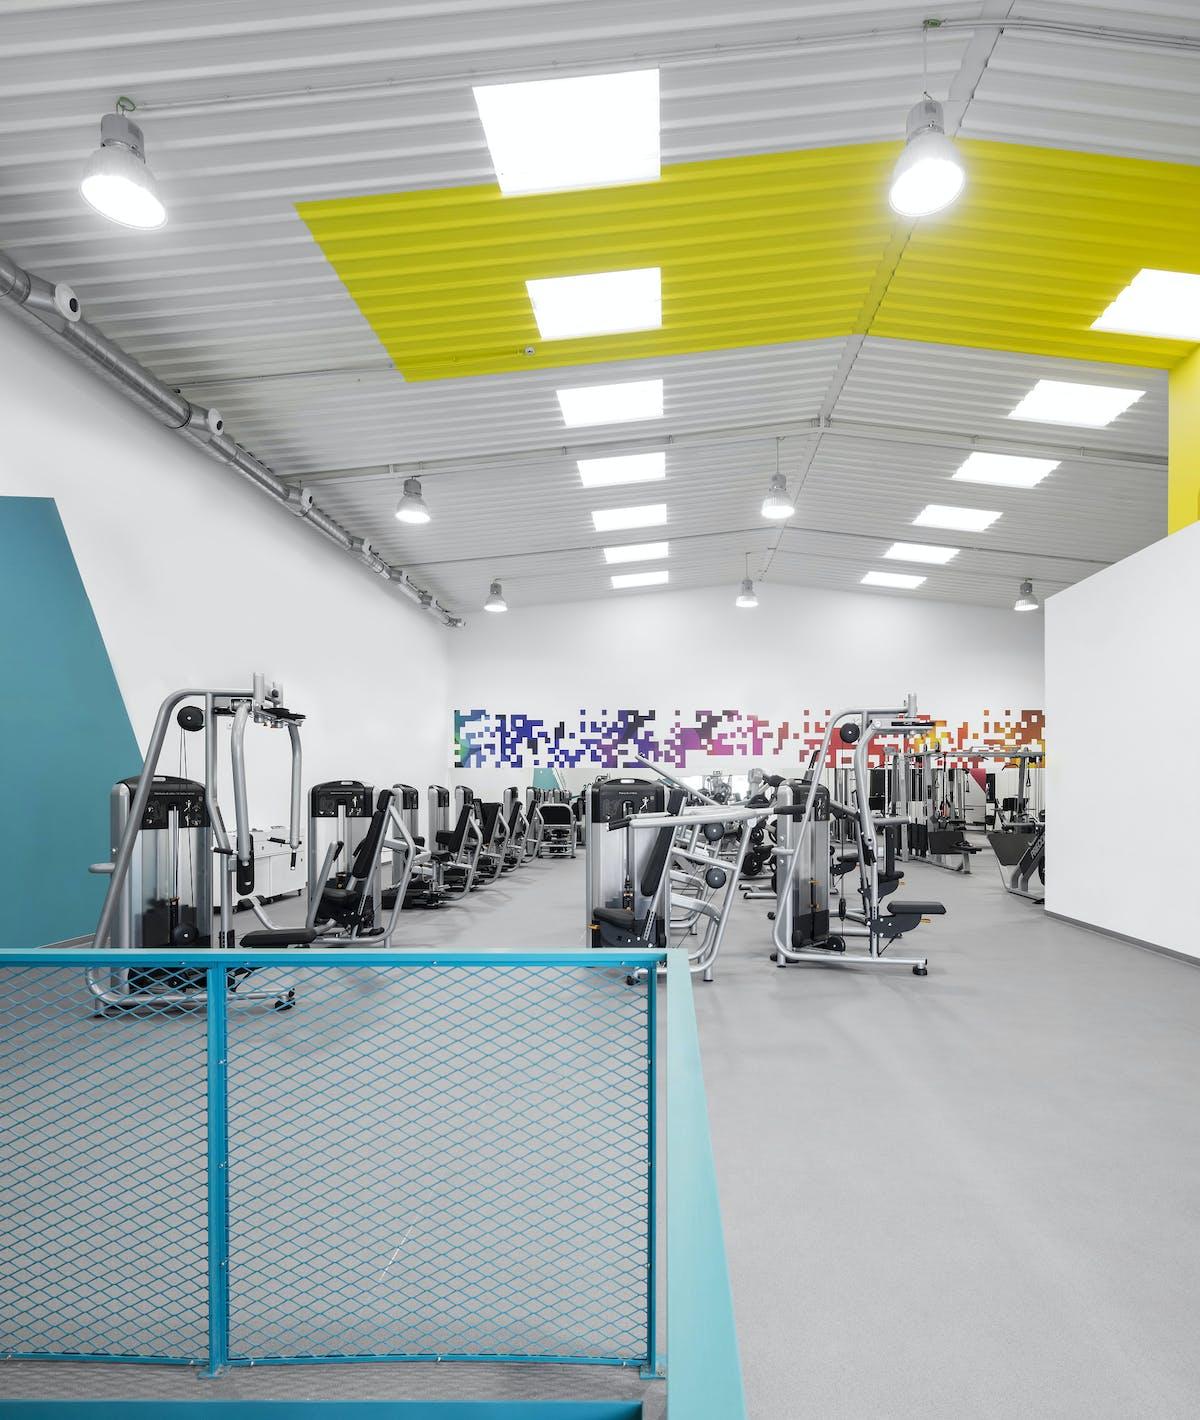 10 Blogs Every Interior Design Fan Should Follow: PUMP Gym In Almada, Lisbon